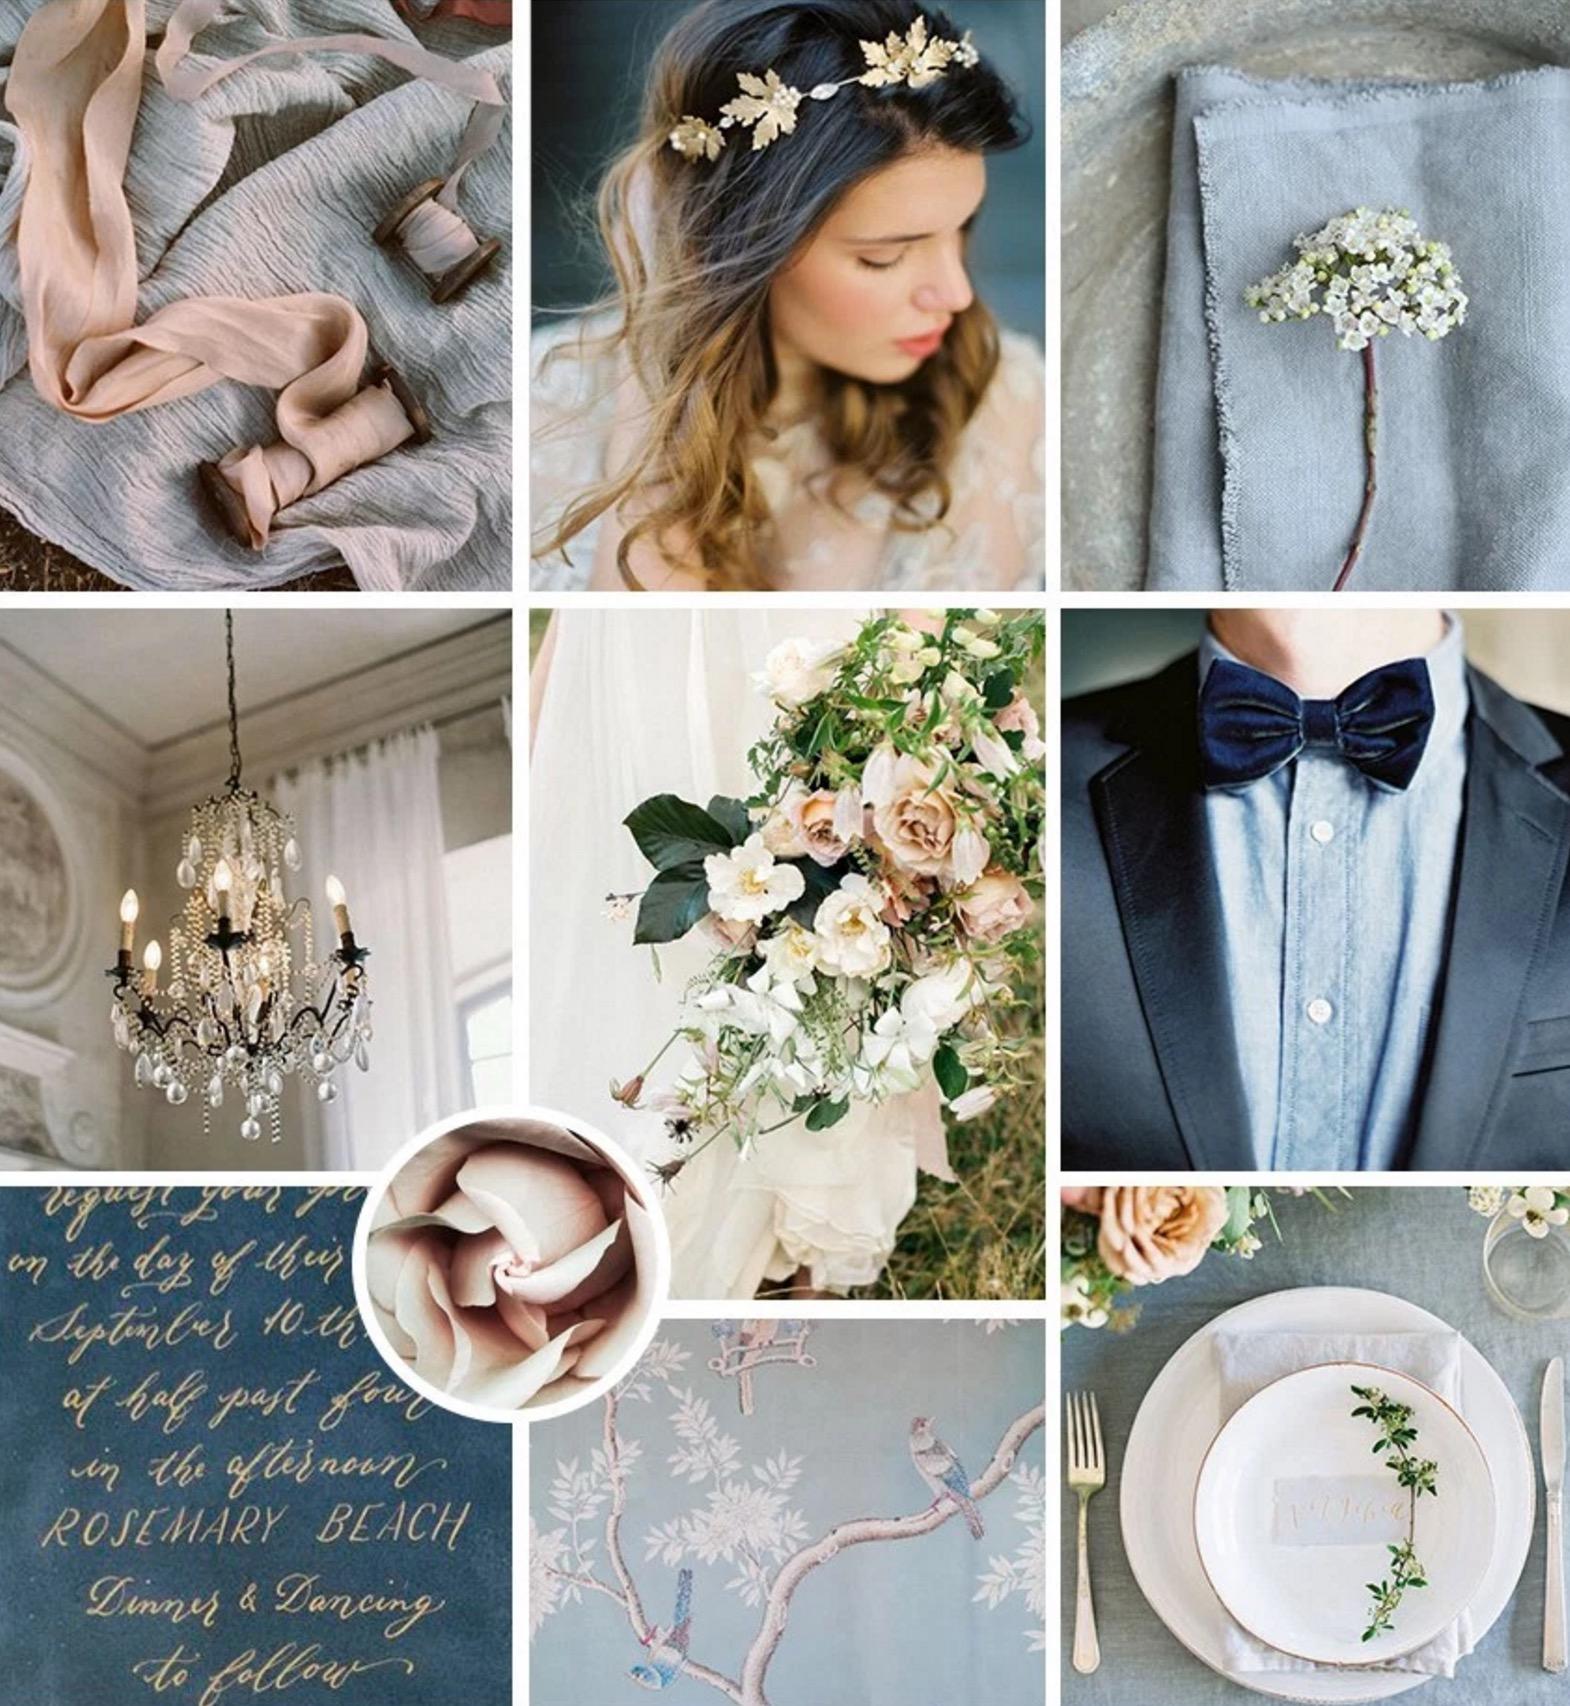 Style Concept – Country House Wedding Elegance on the Cornish Coast